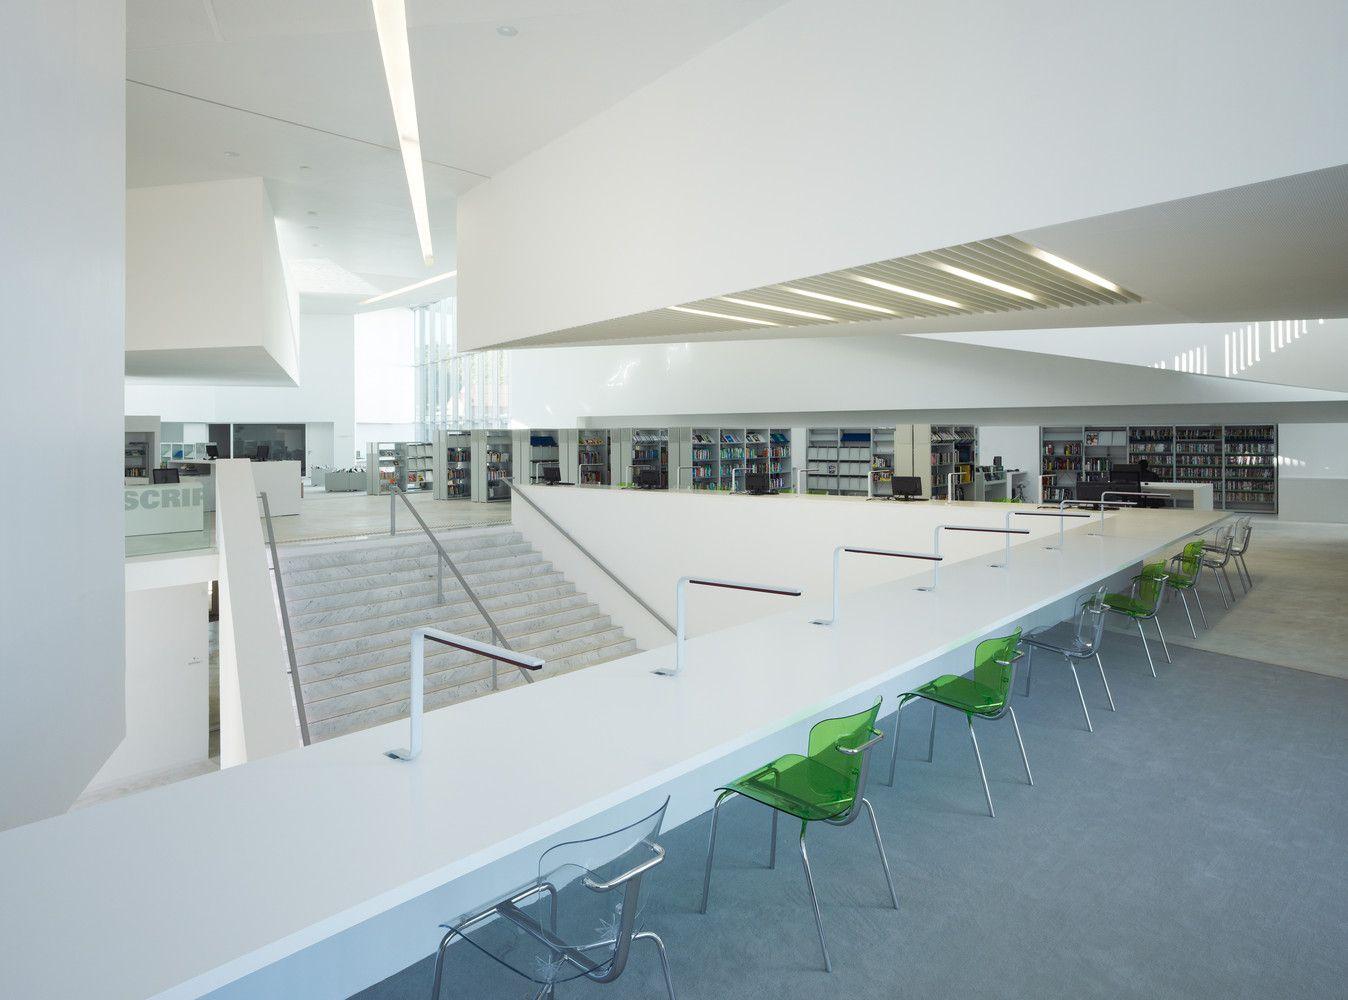 Galeria de Biblioteca em Anzin / Dominique Coulon & Associés - 24